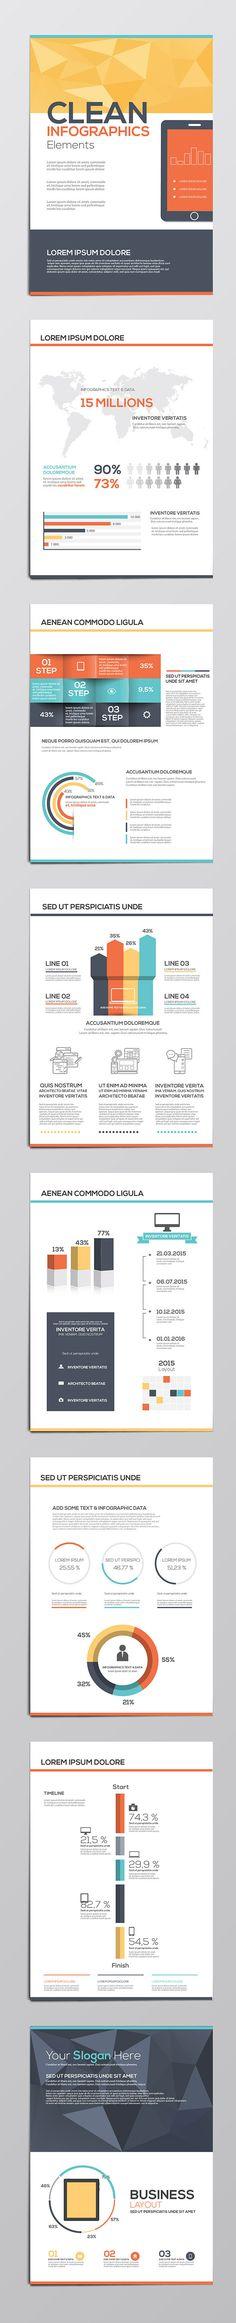 https://www.behance.net/gallery/24890281/Business-infographics-elements-for-corporate-brochures